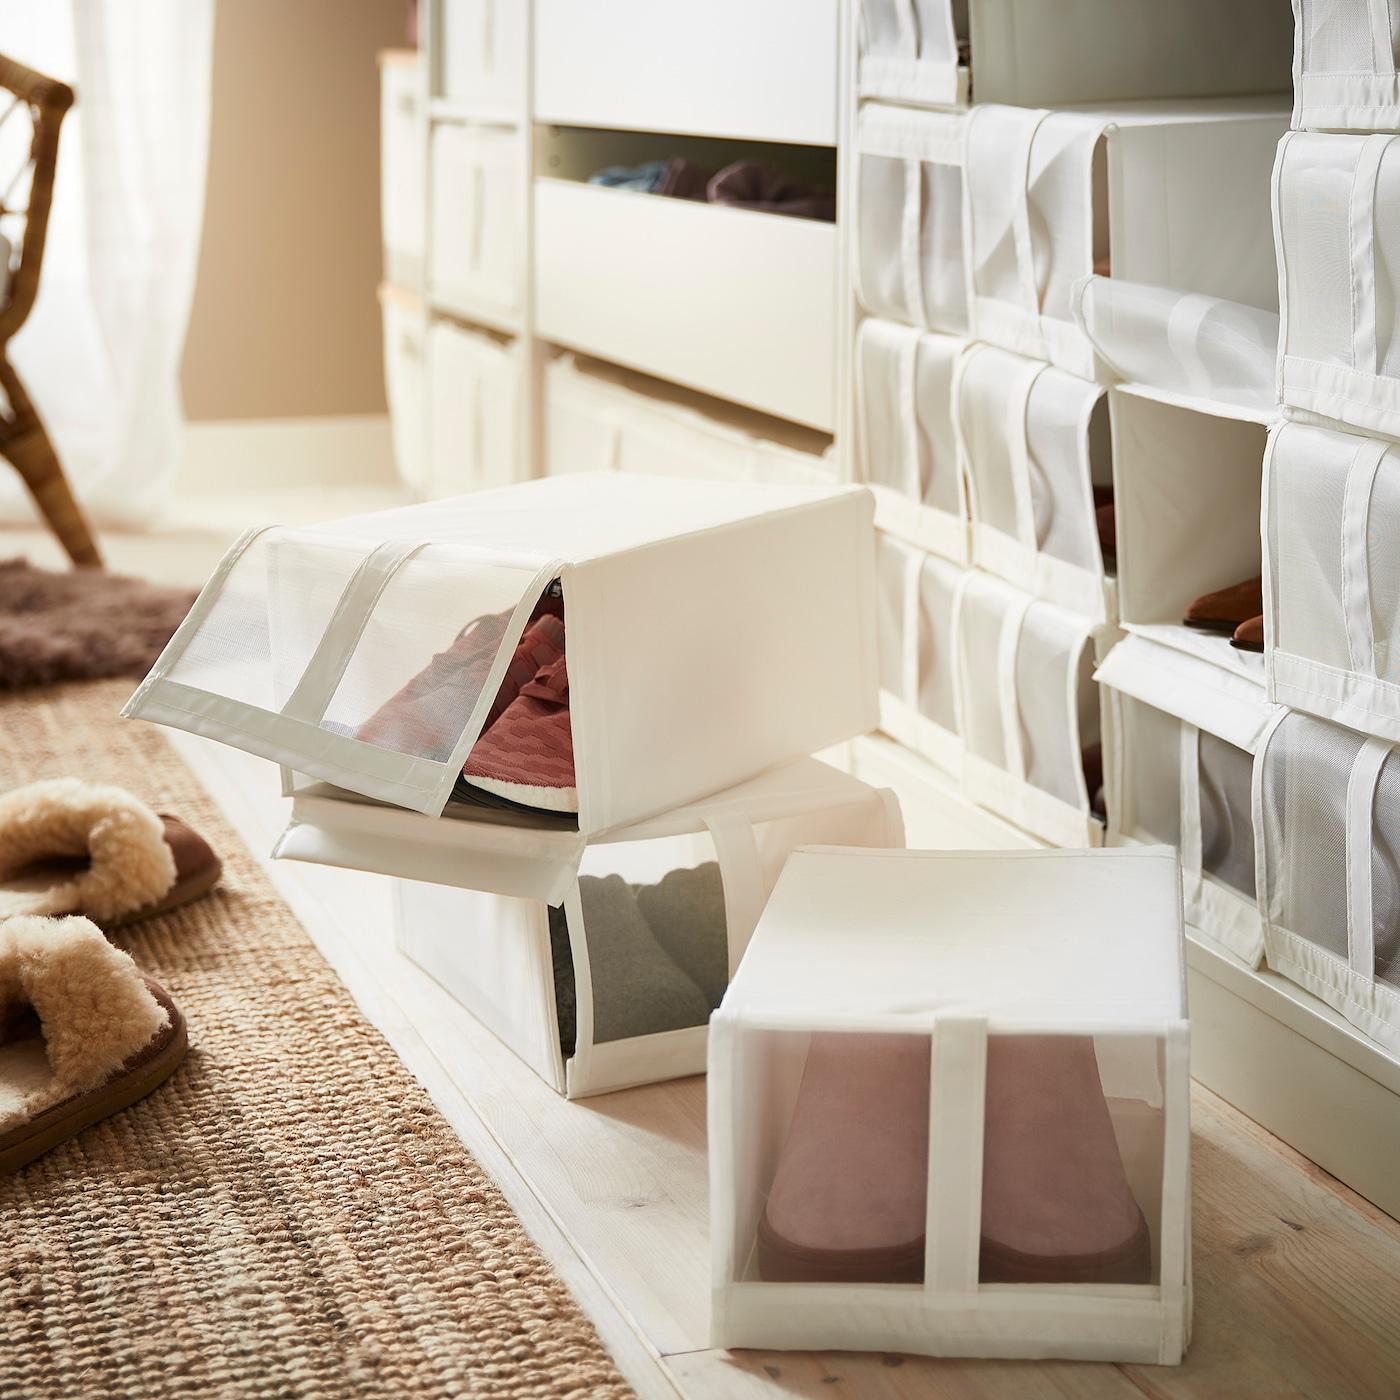 SKUBB Shoe box, white, 22x34x16 cm